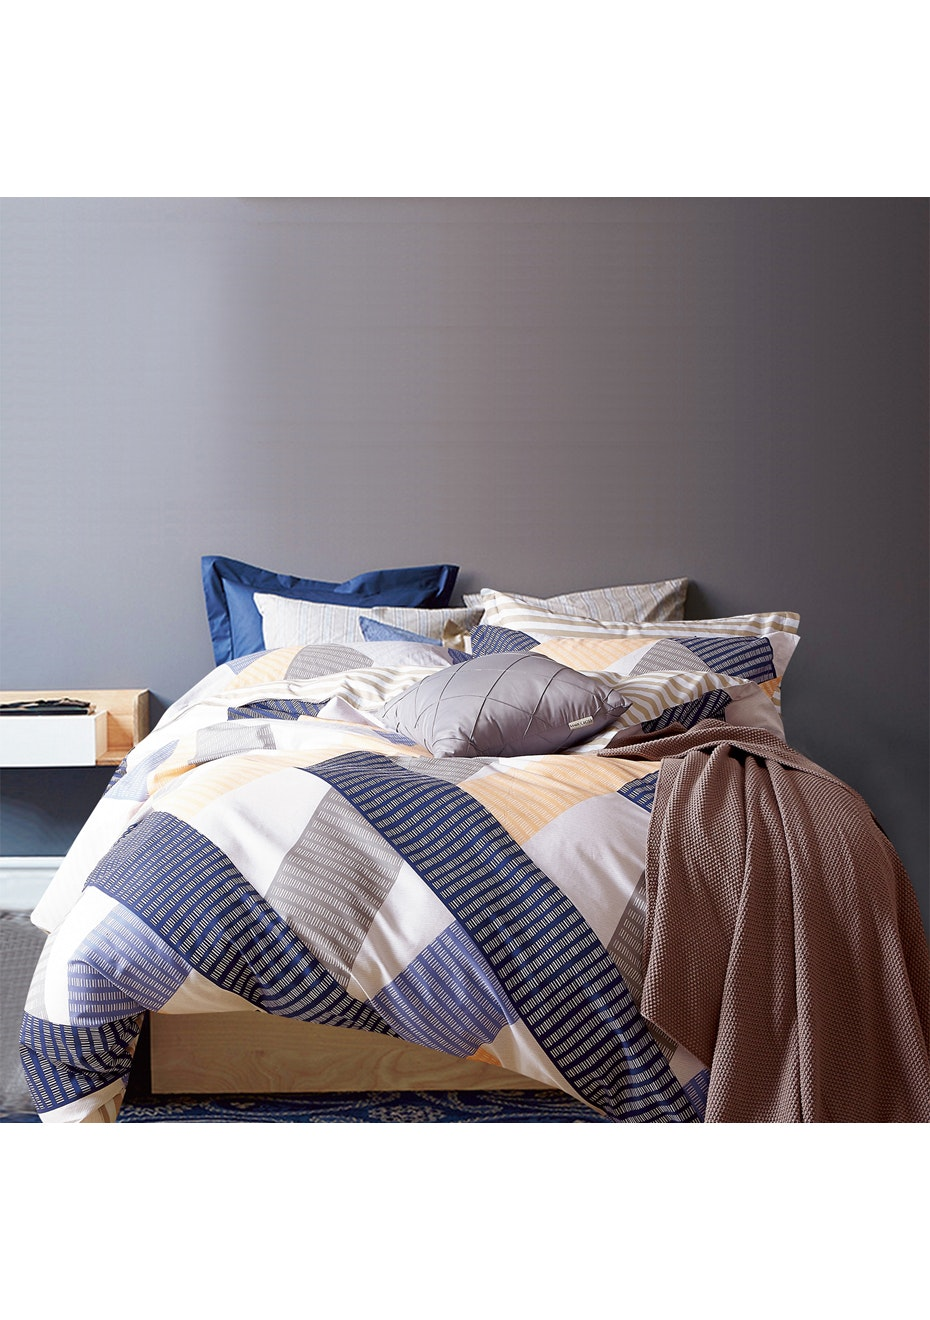 Terrigal Quilt Cover Set - Reversible Design - 100% Cotton - Queen Bed